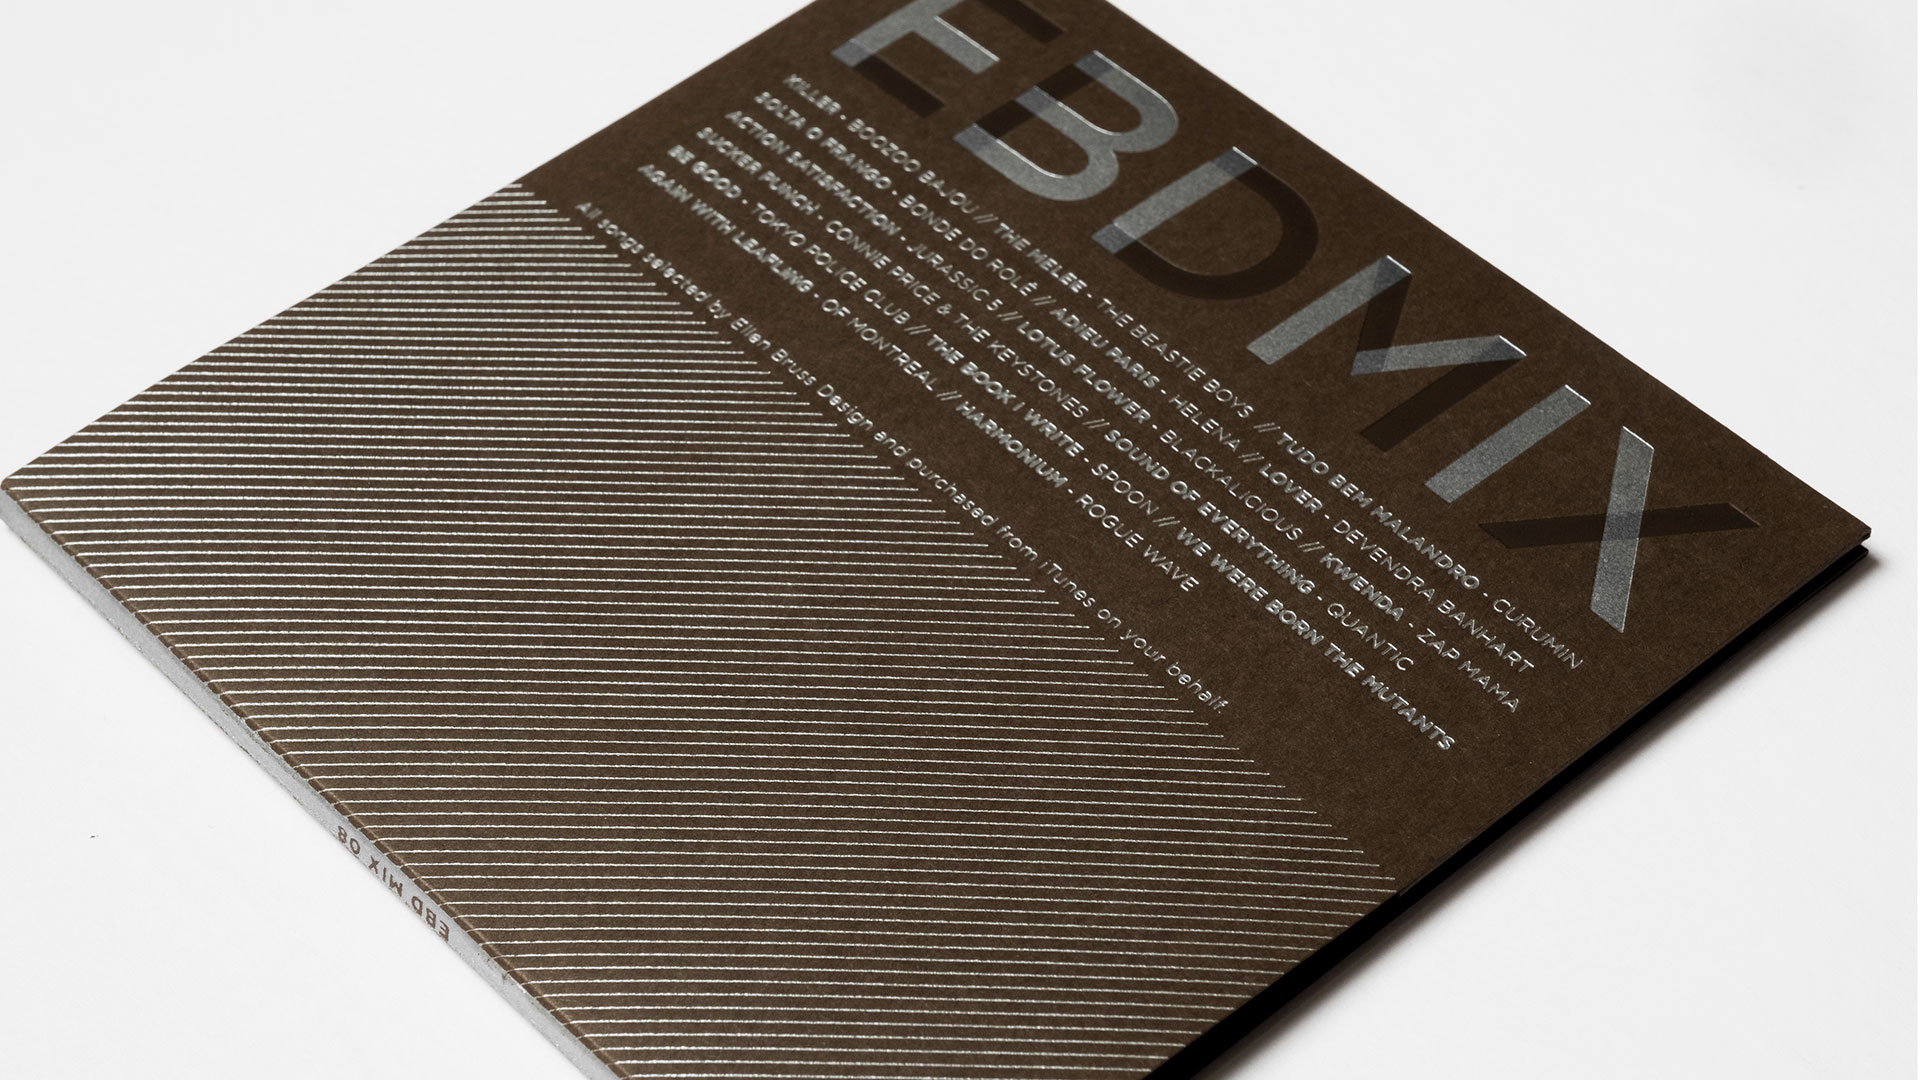 1126-ebd-mix-1